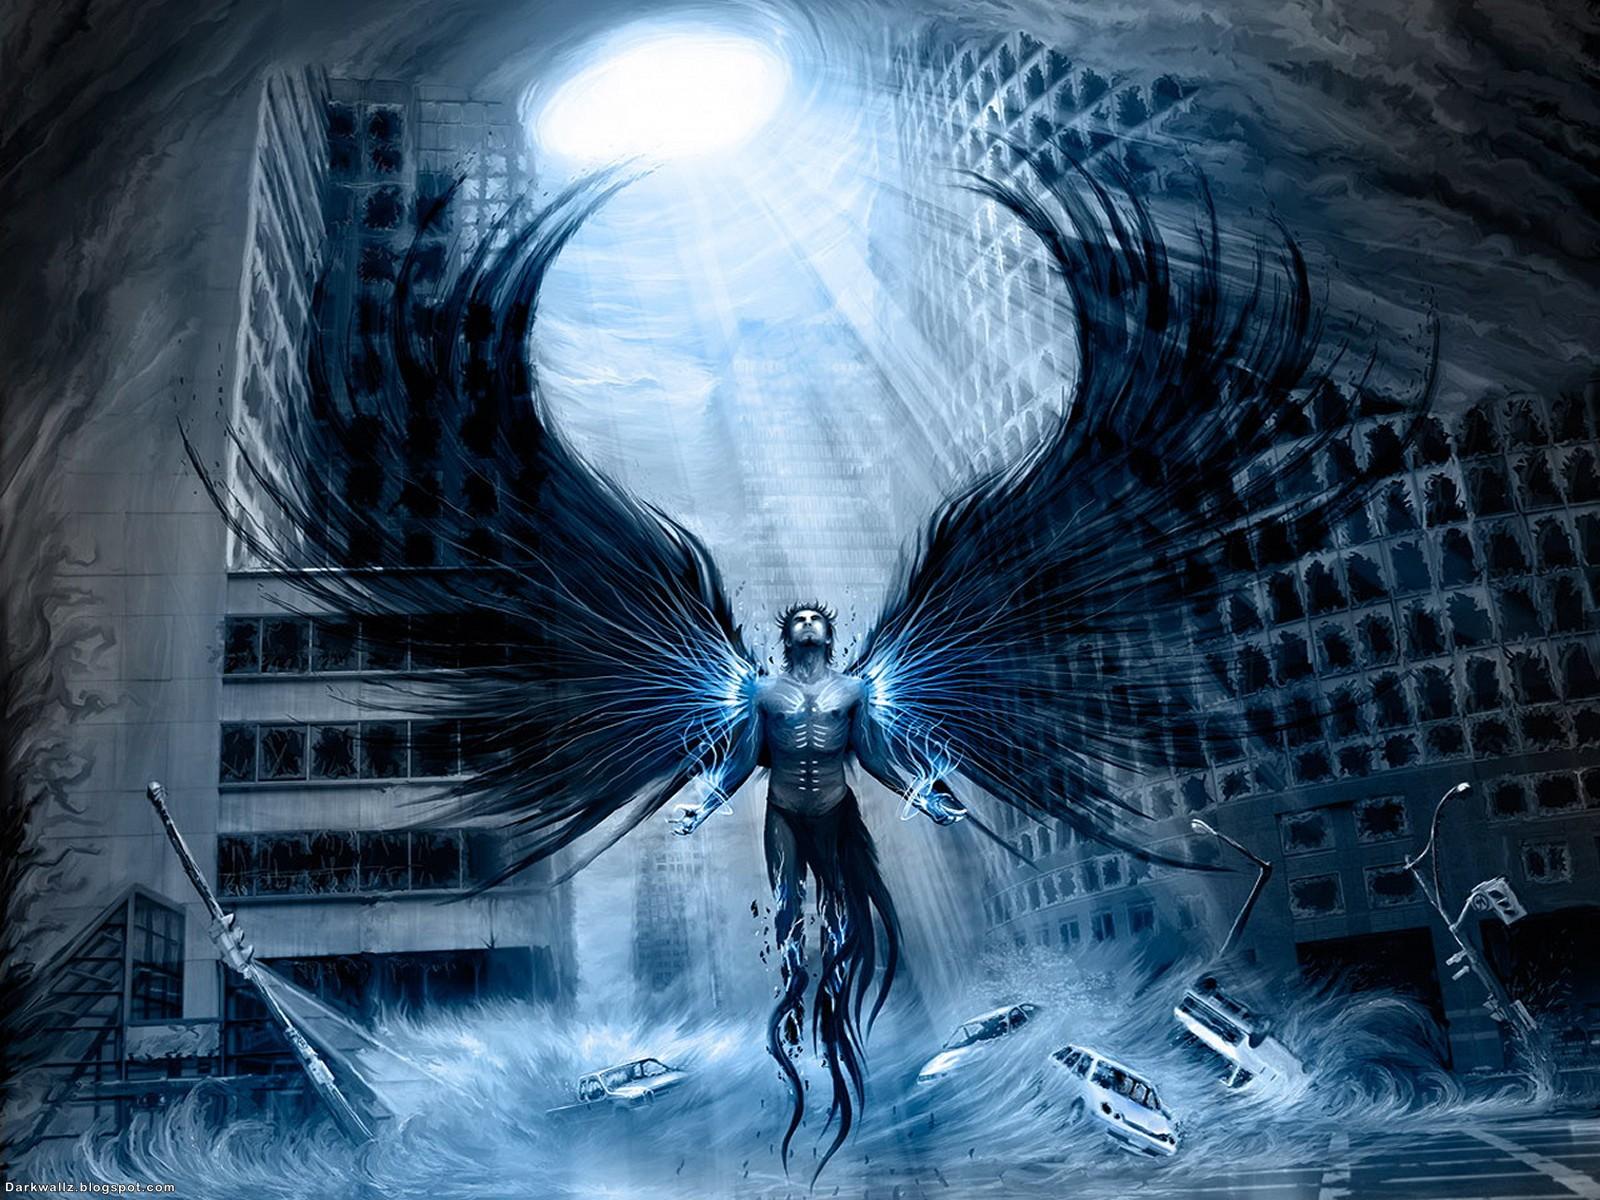 http://2.bp.blogspot.com/_-jo2ZCYhKaY/S4wMjl691eI/AAAAAAAAHBs/rGa0U1k8pYg/s1600/Dark_Angel_Wallpapers_07%20(darkwallz.blogspot.com).jpg